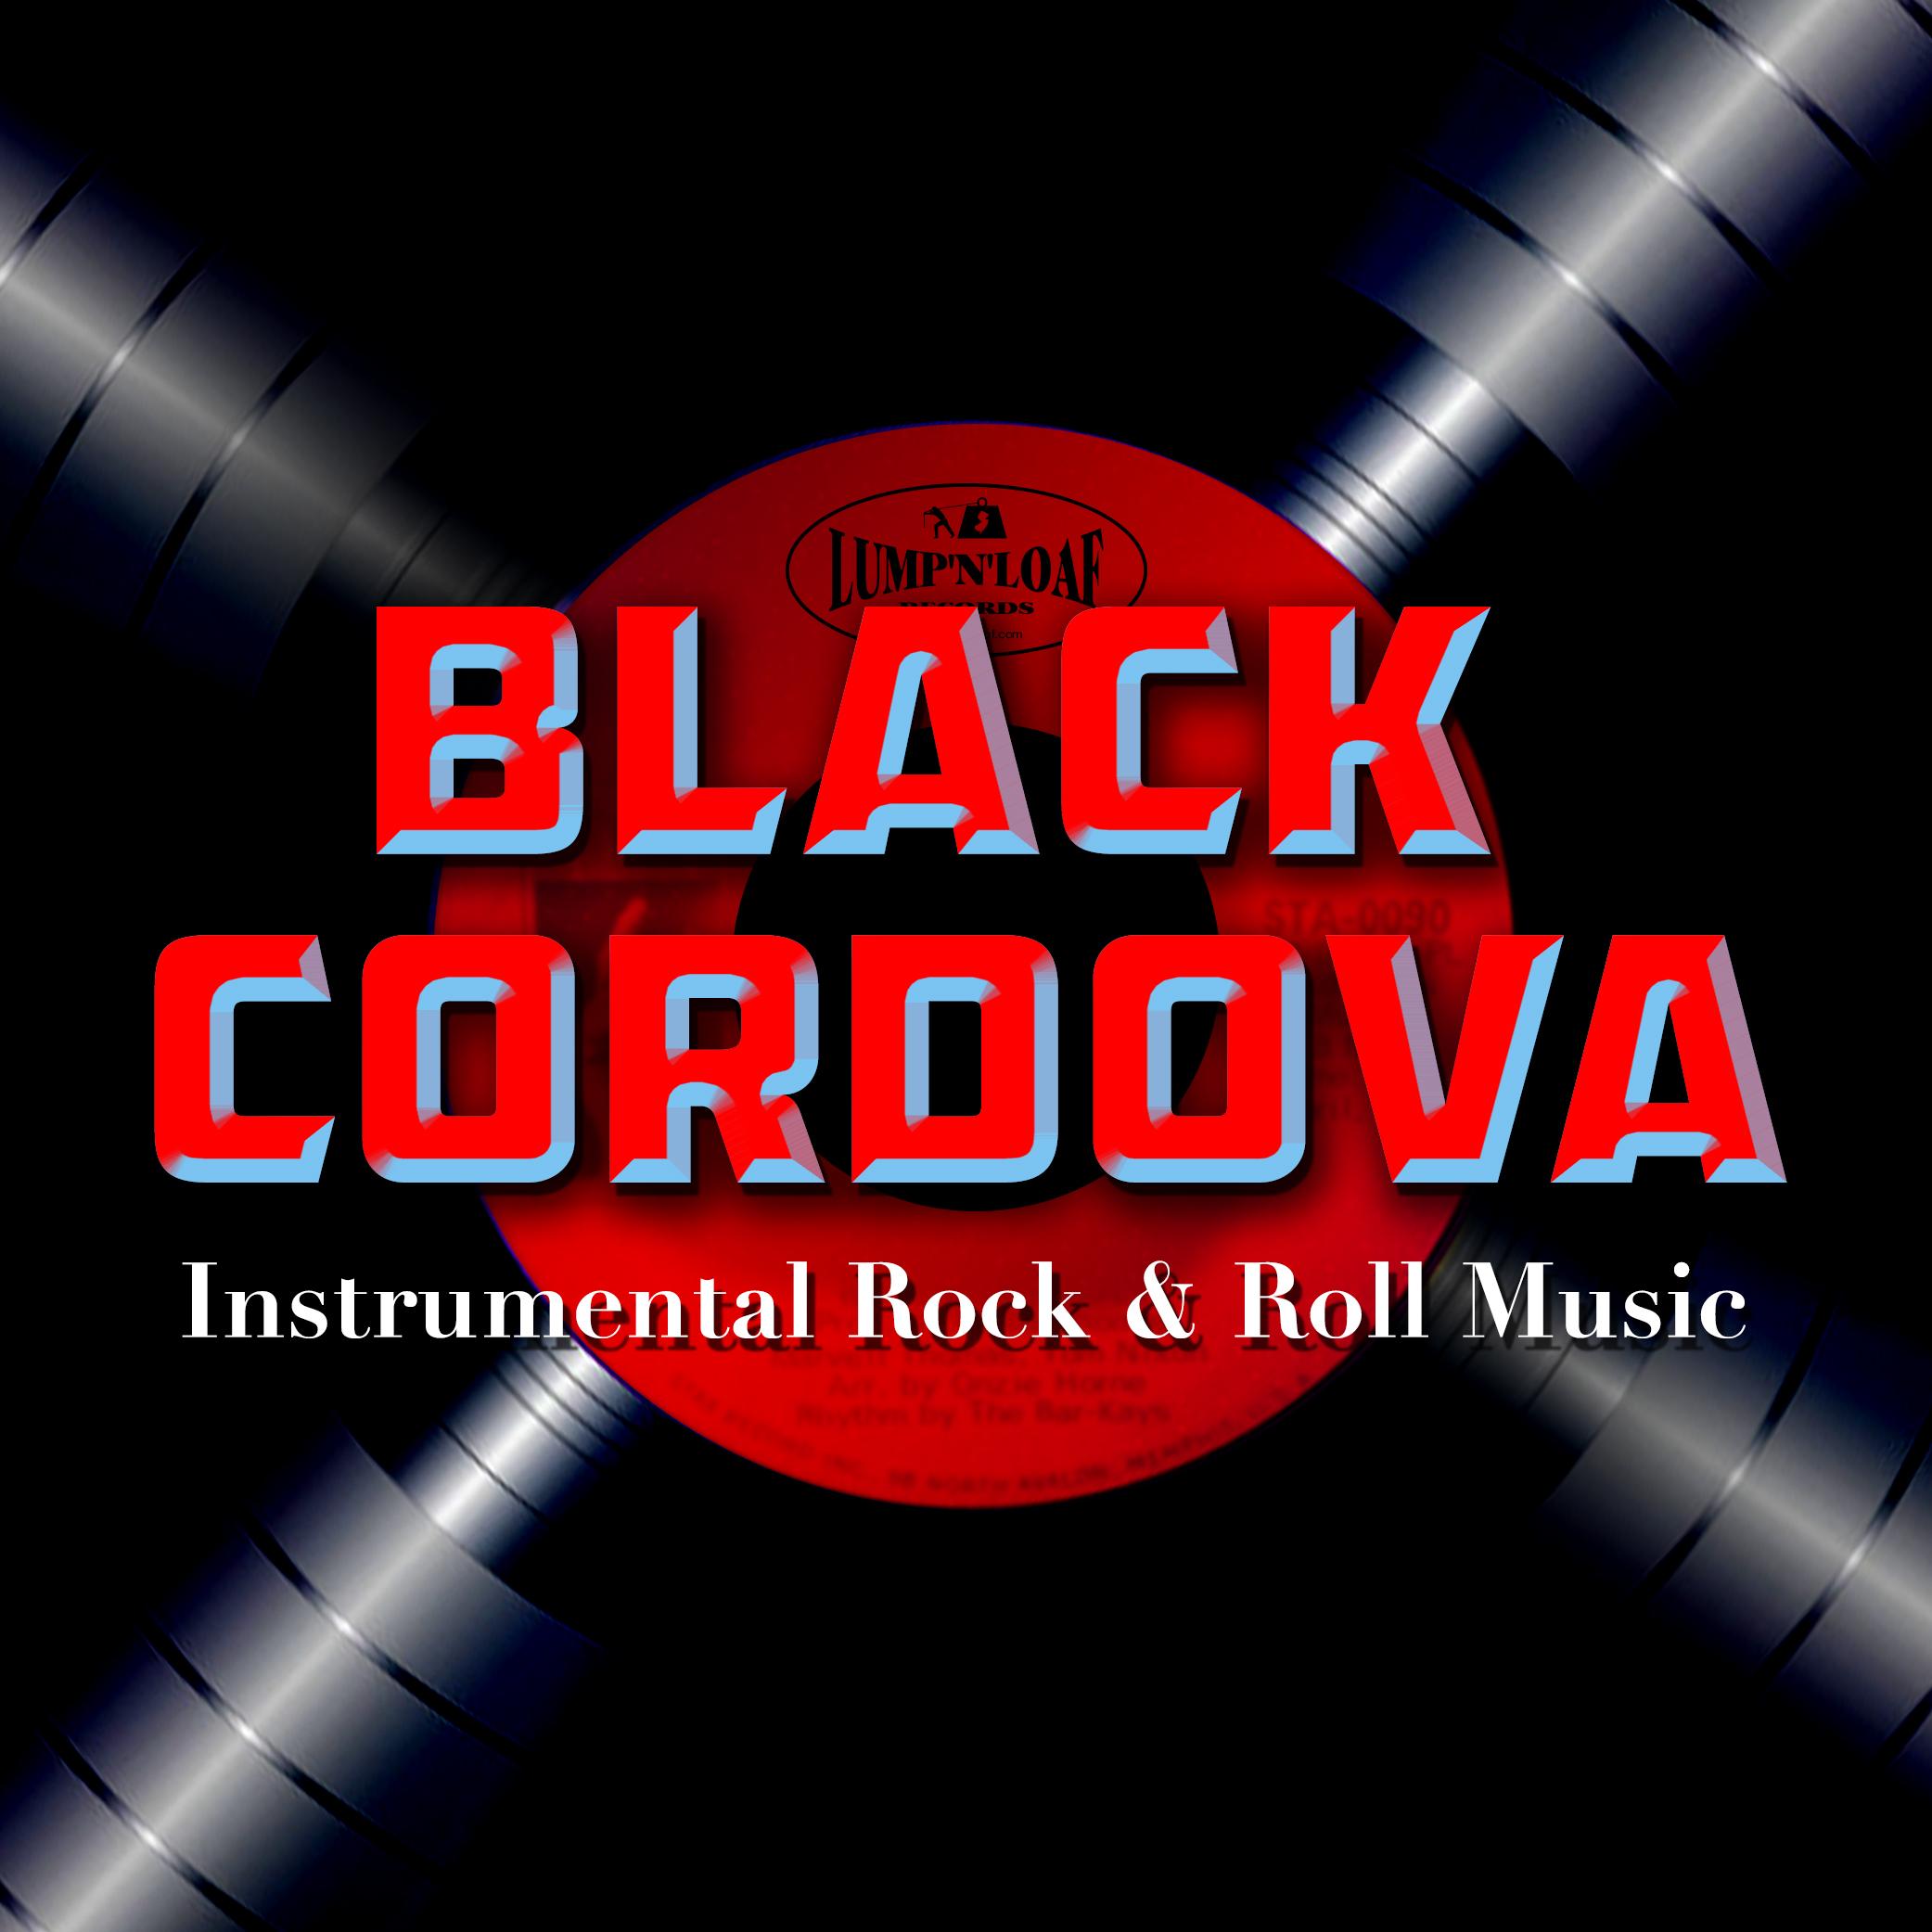 Introducing Black Cordova!